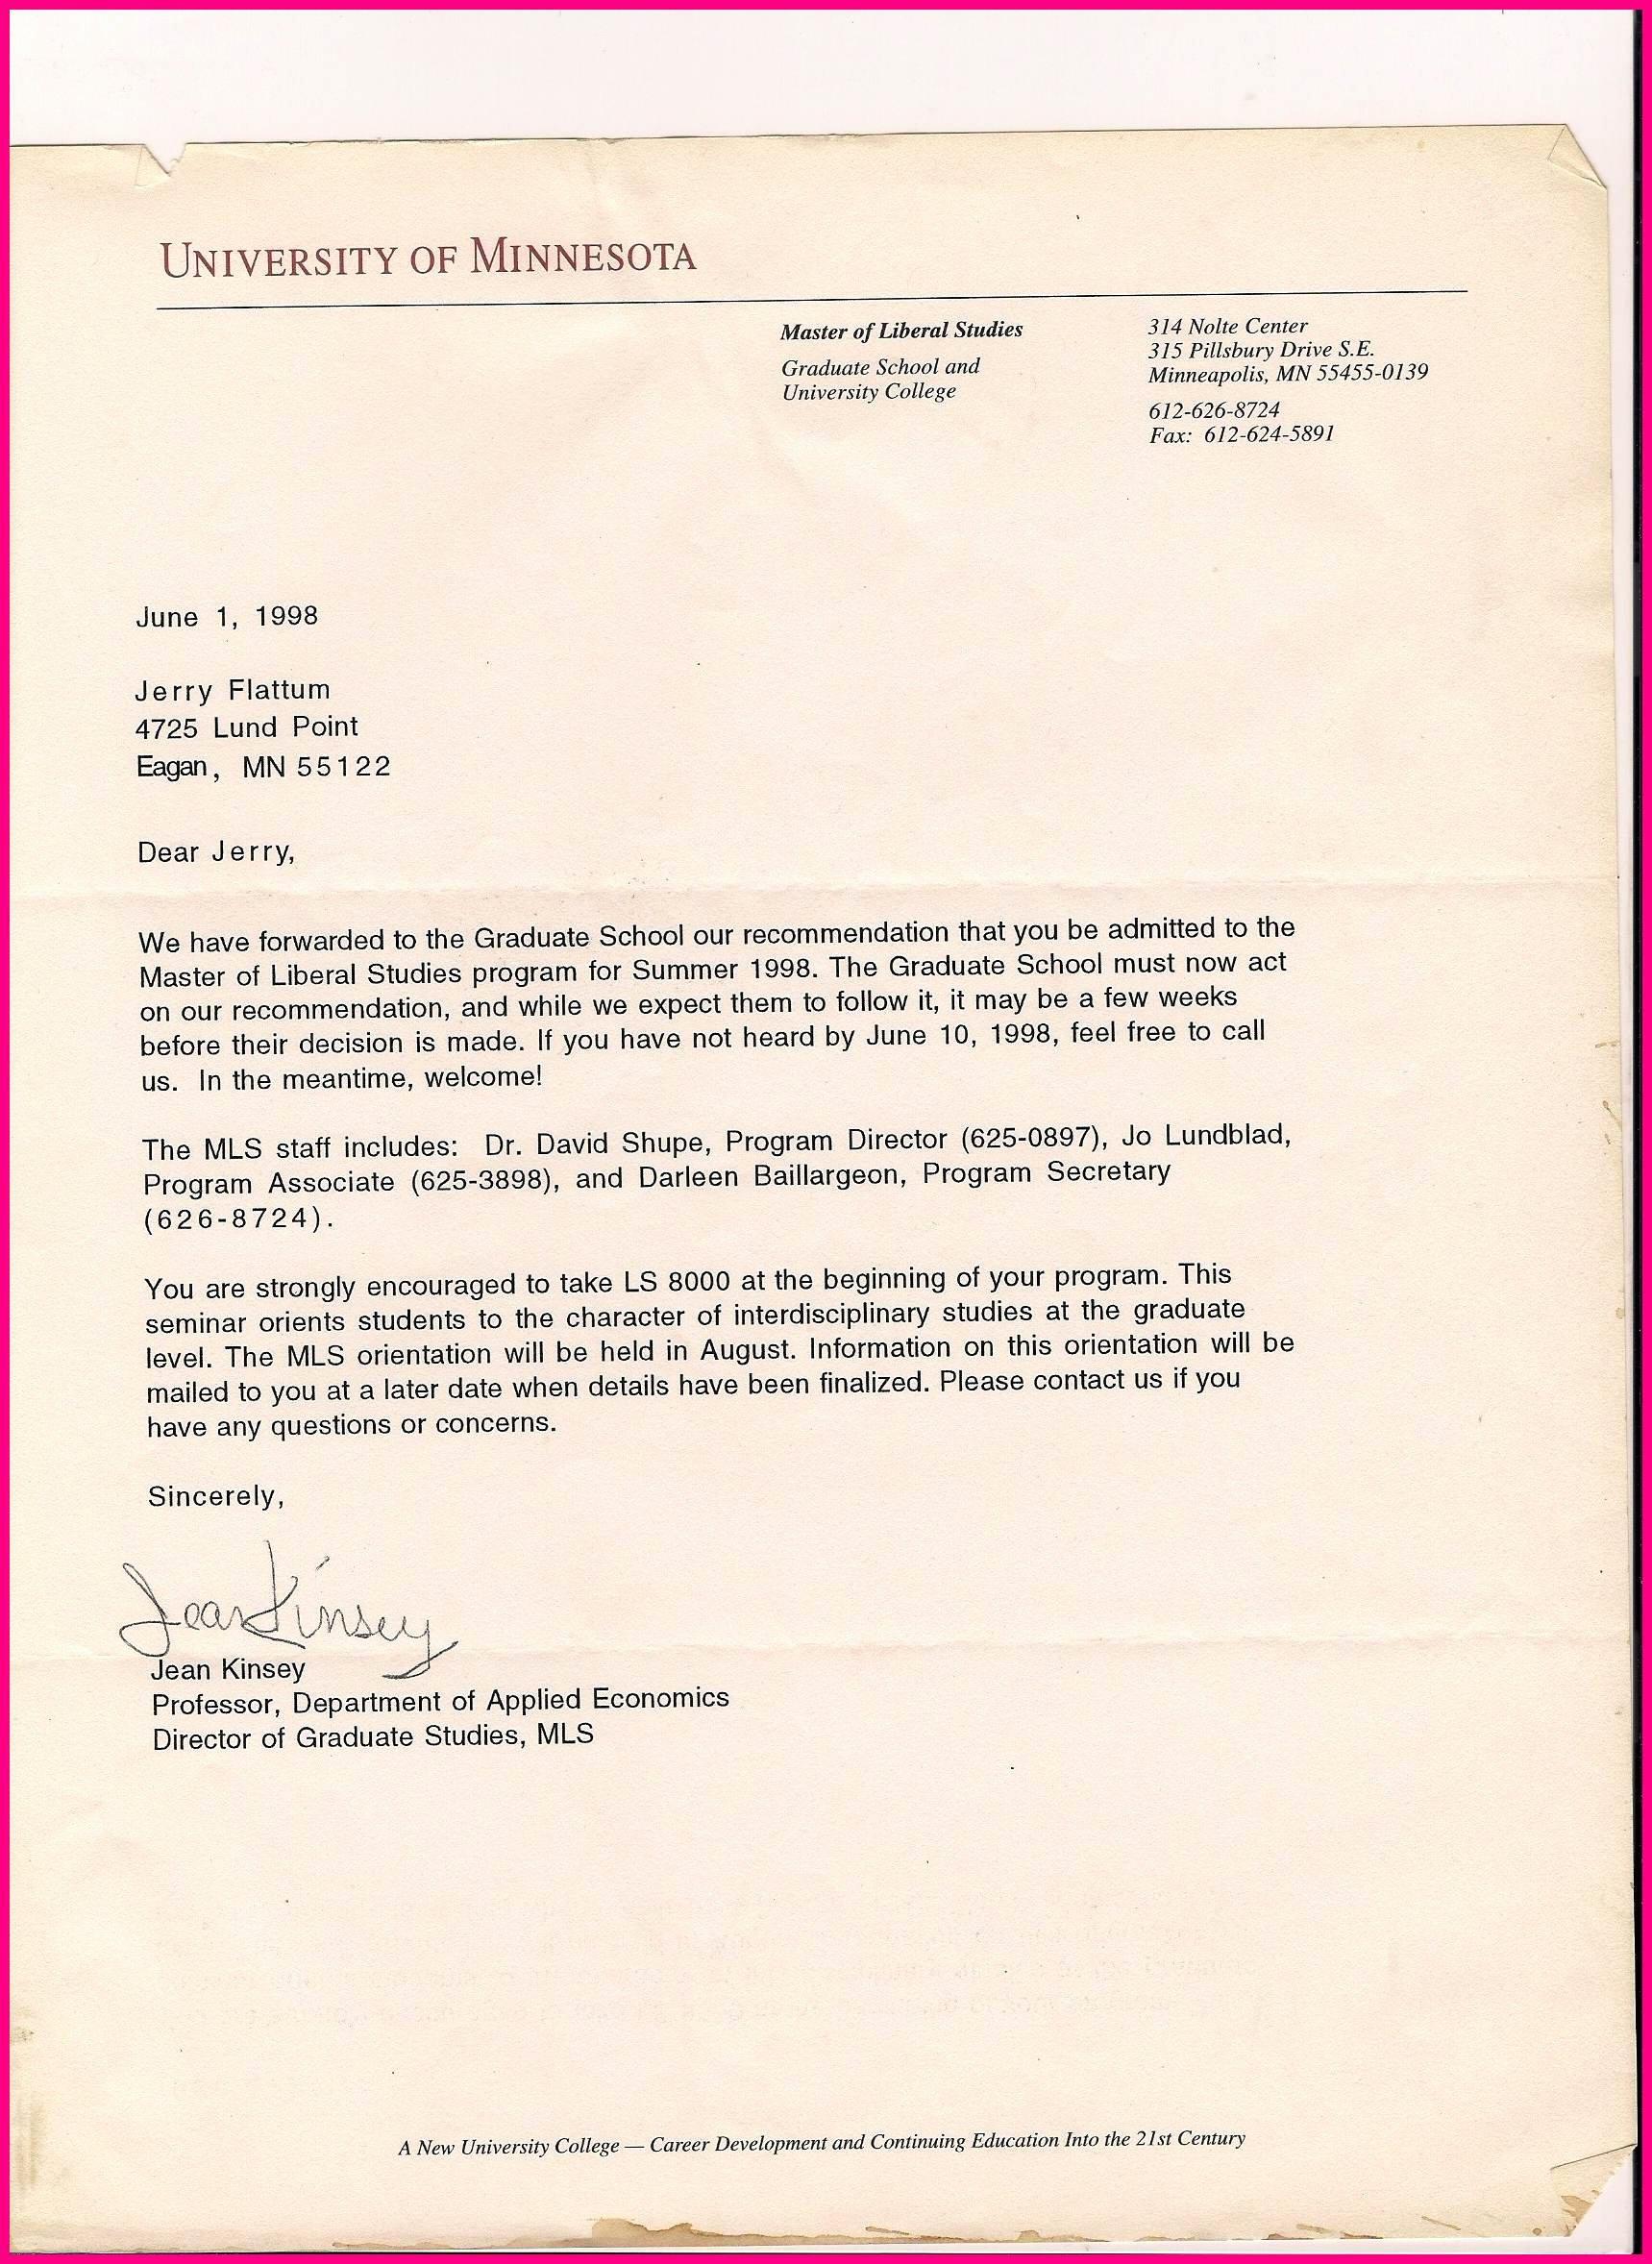 Letter Of Recommendation social Work Elegant Sample Re Mendation Letter for Graduate Student